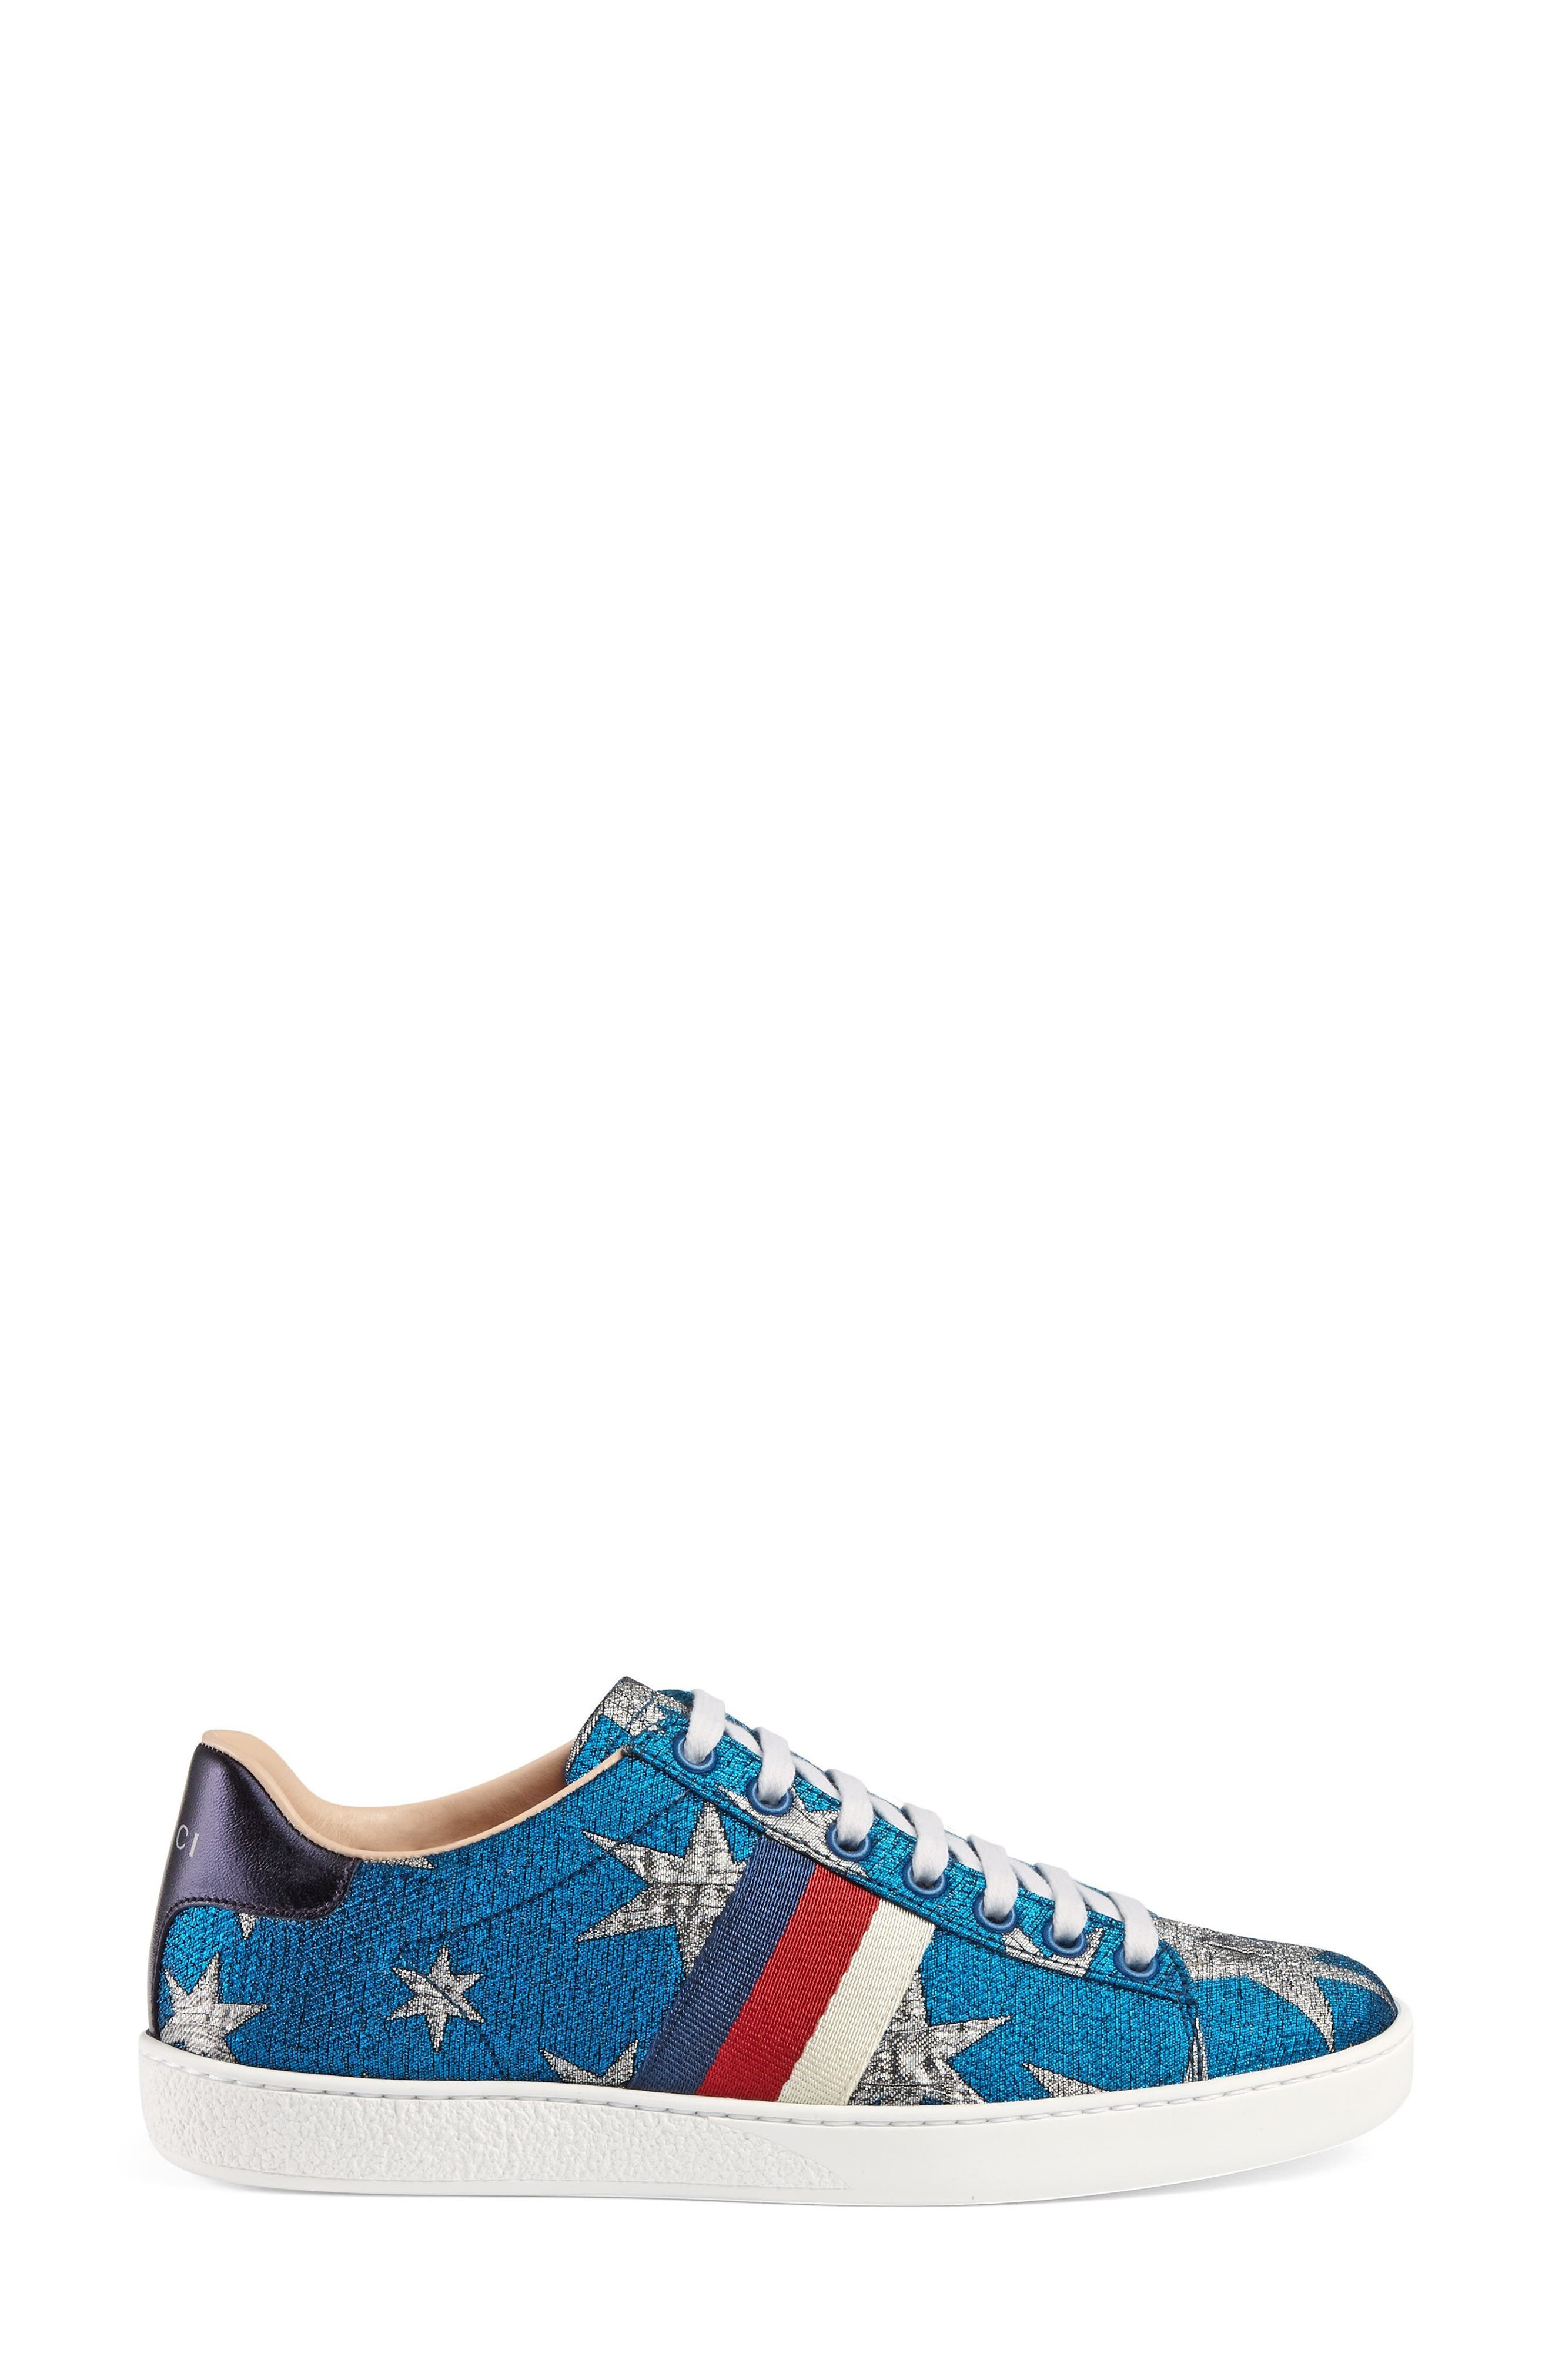 Gucci Star New Ace Sneaker (Women)